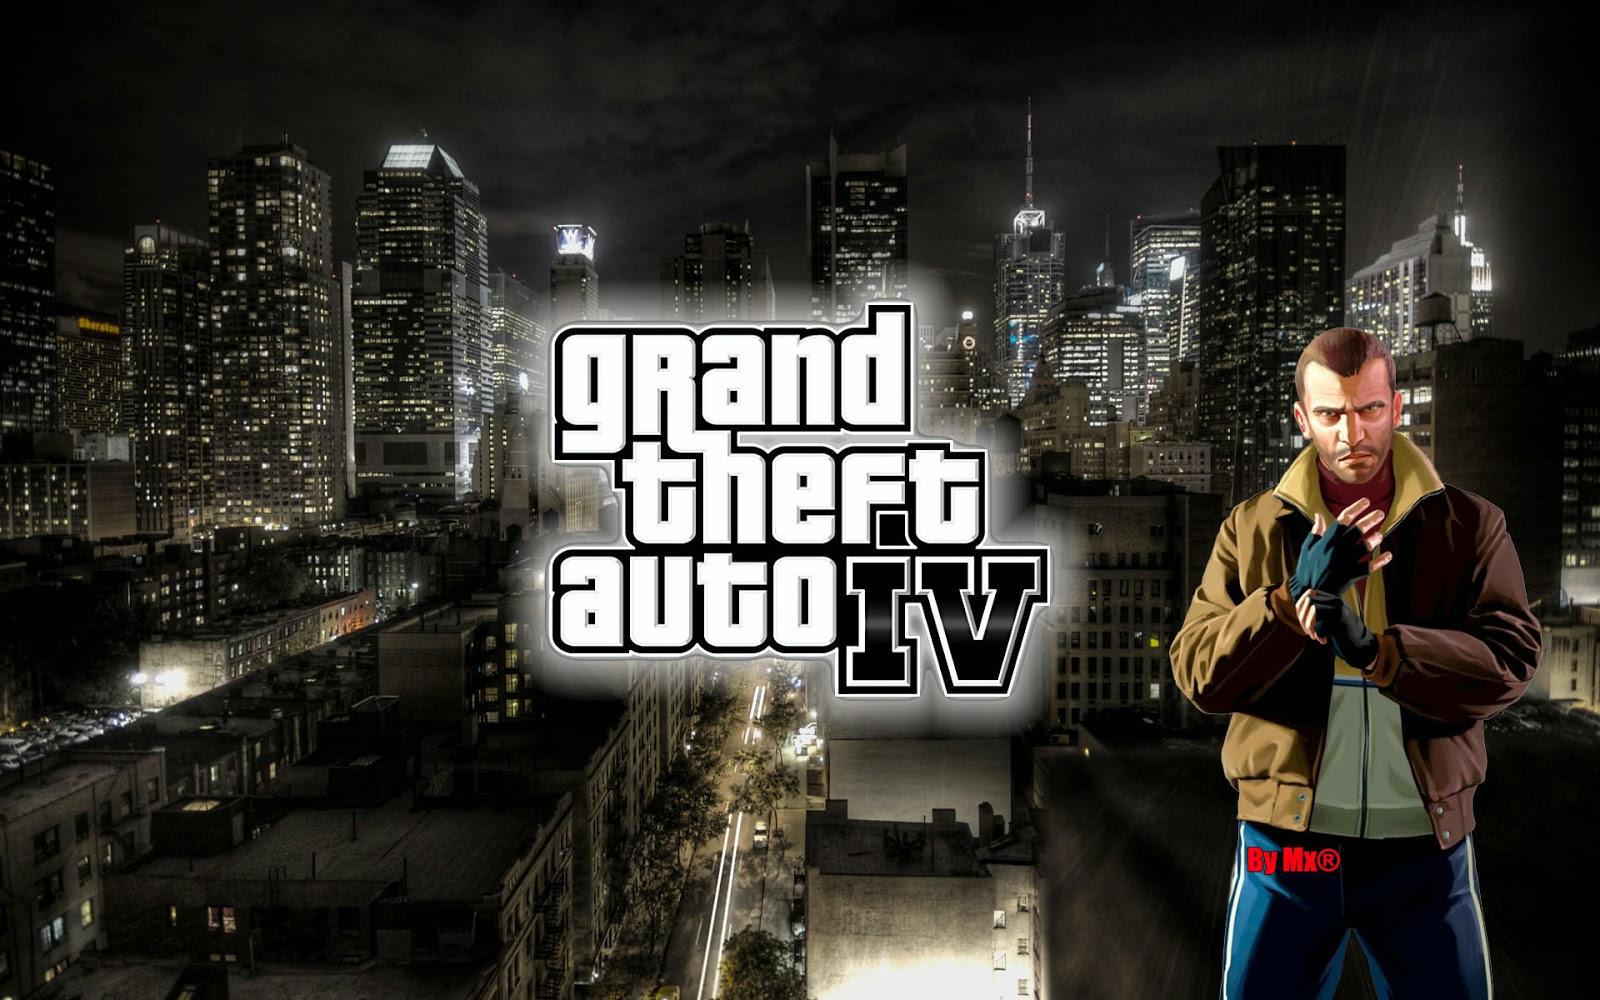 Download GTA IV PC Full Version + Crack + Patch